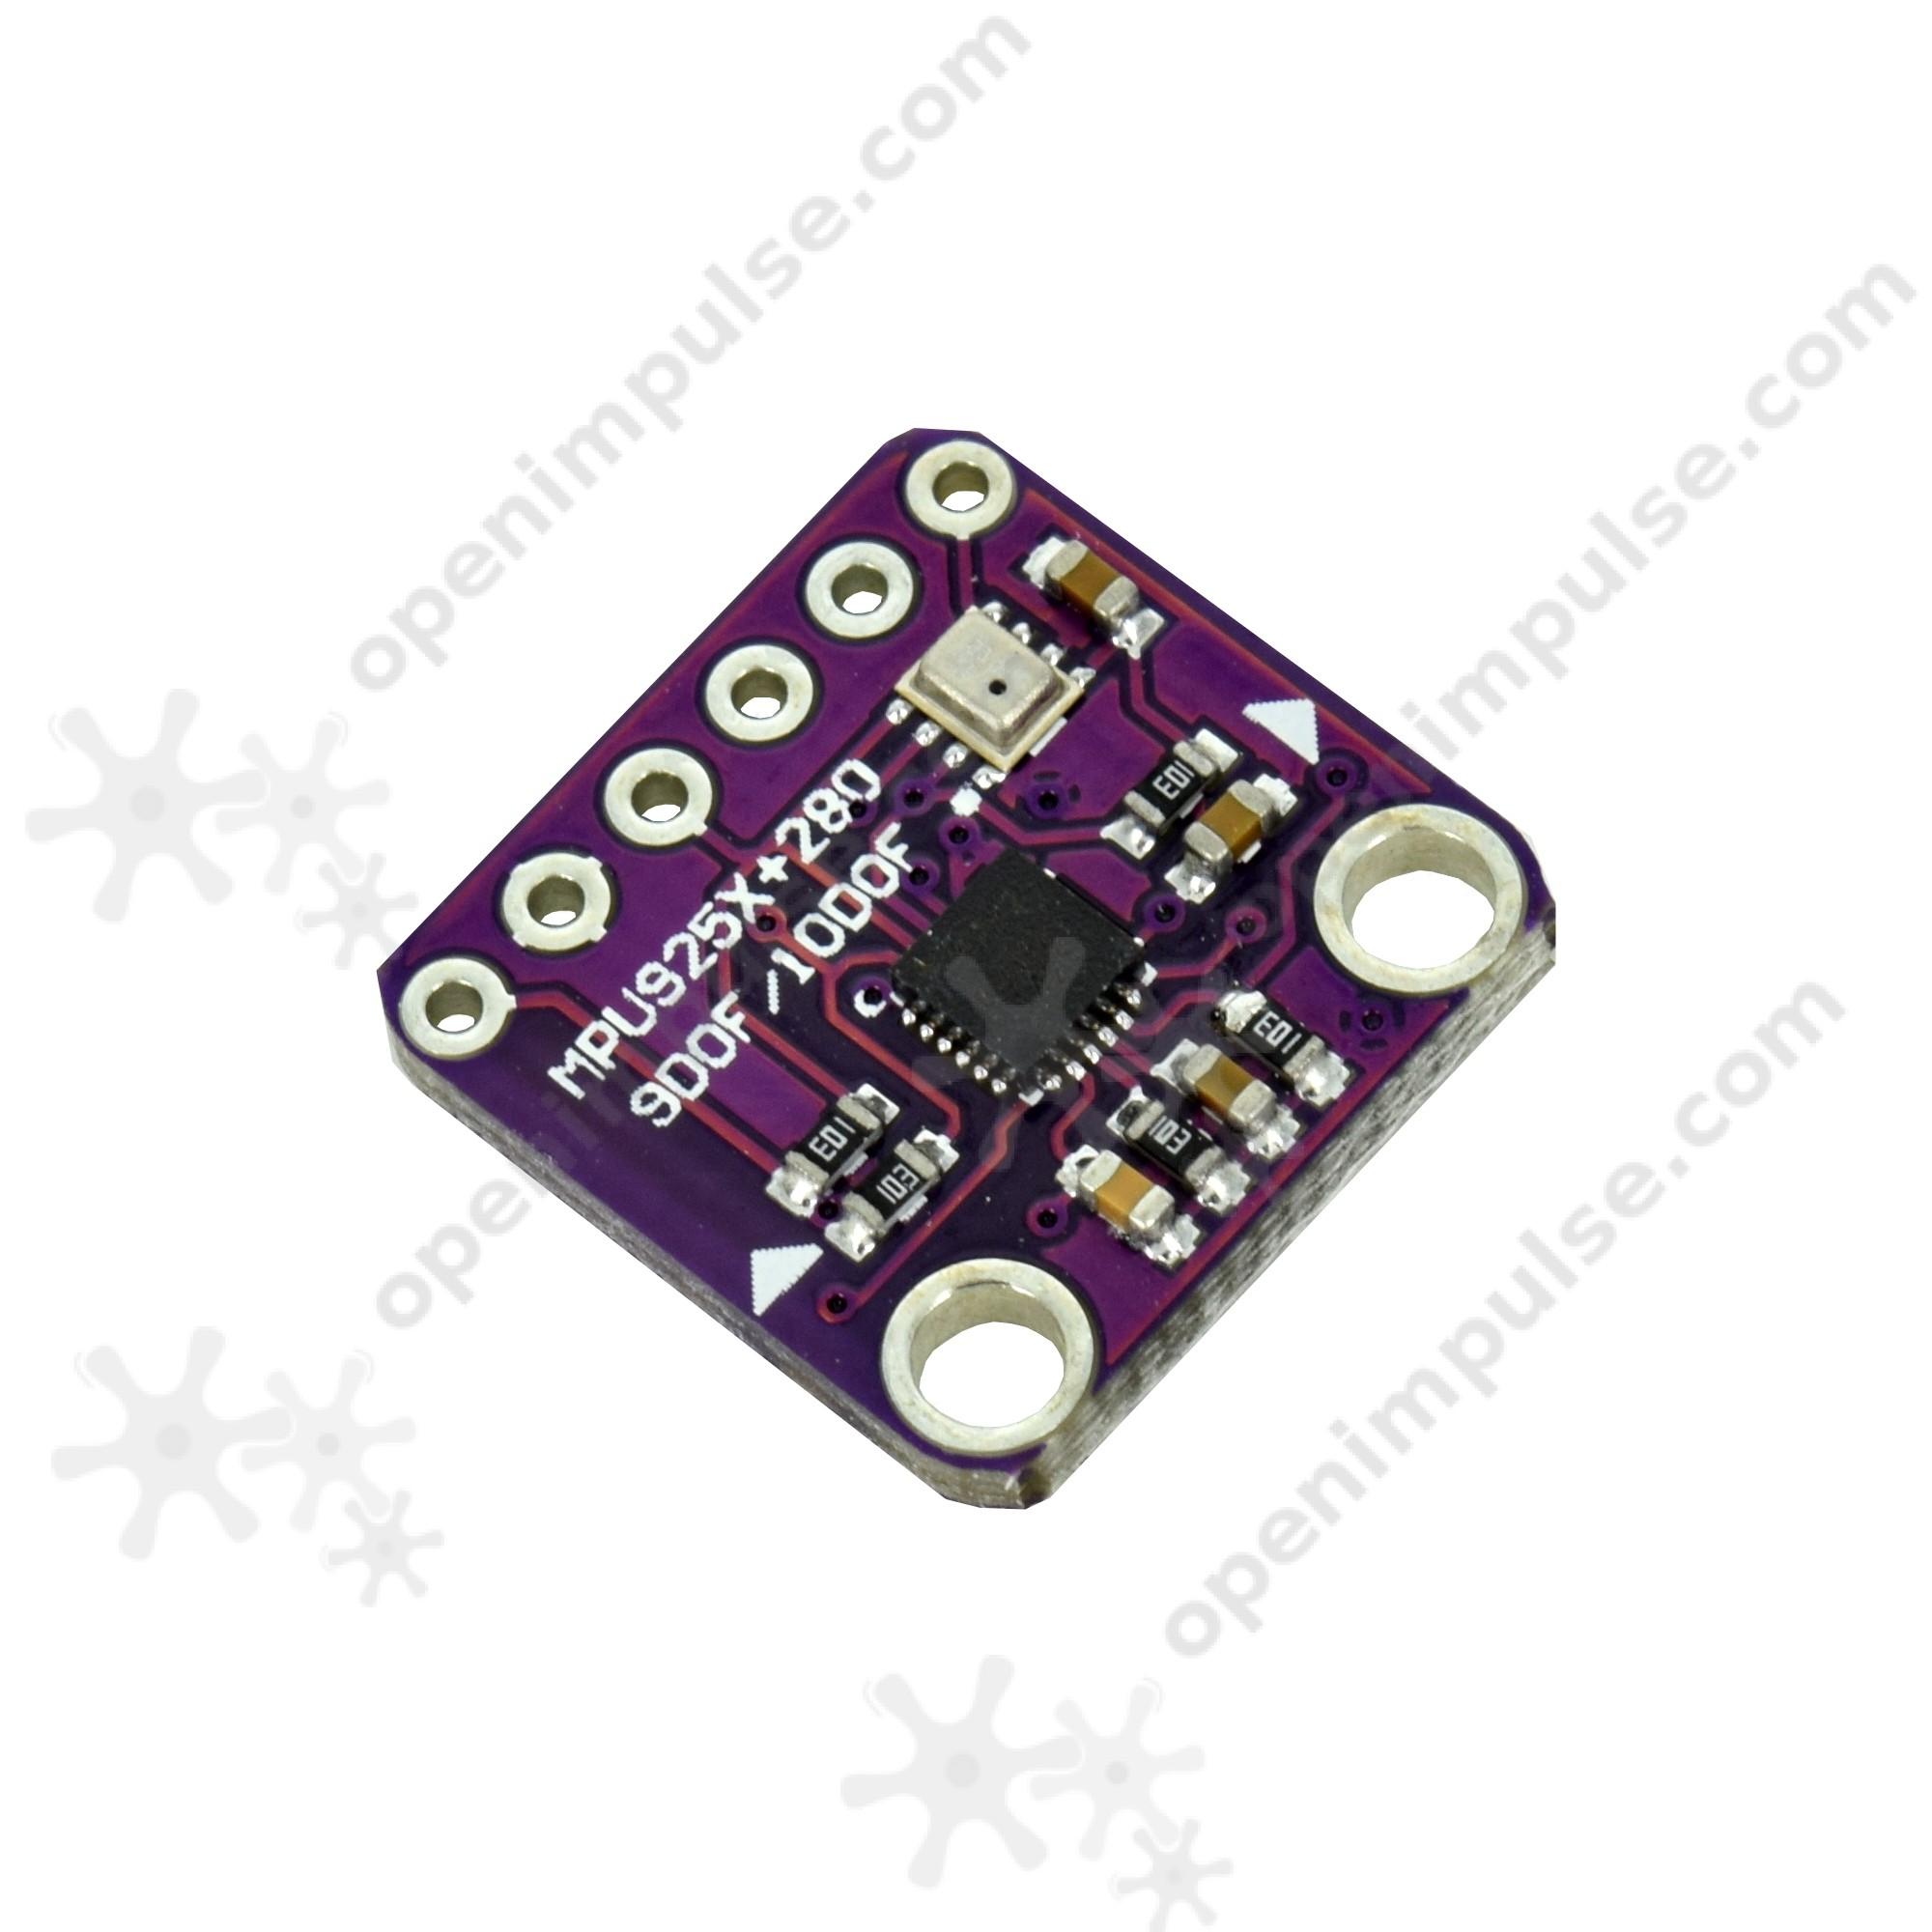 MPU9250 and BMP280 10DOF Digital Accelerometer, Giroscope